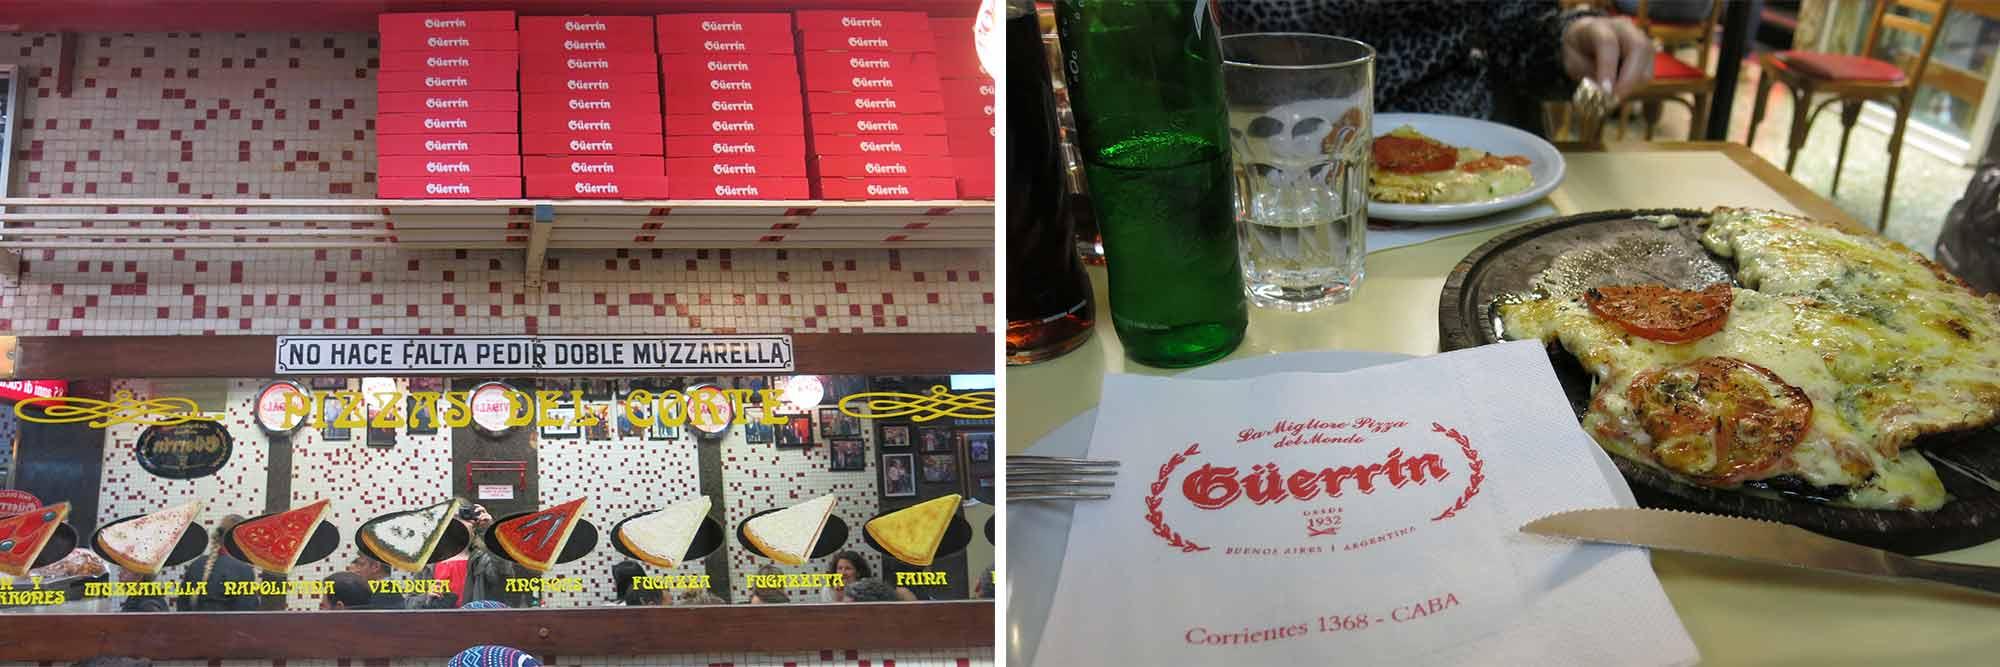 Femtastics_Lola-Behrens_BuenosAires_Pizza_Alternativ